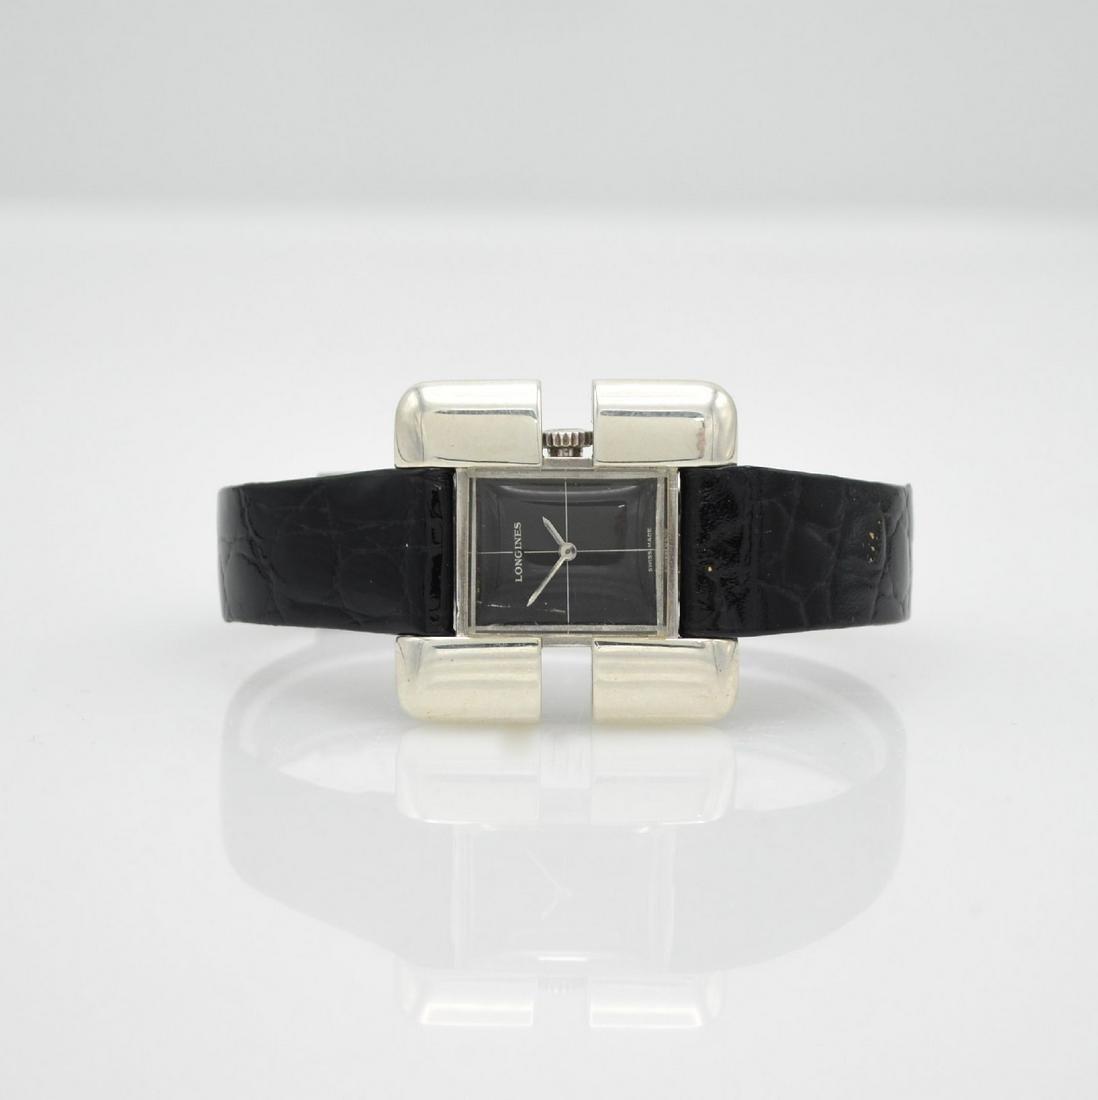 LONGINES Serge Manzon rare wristwatch in silver